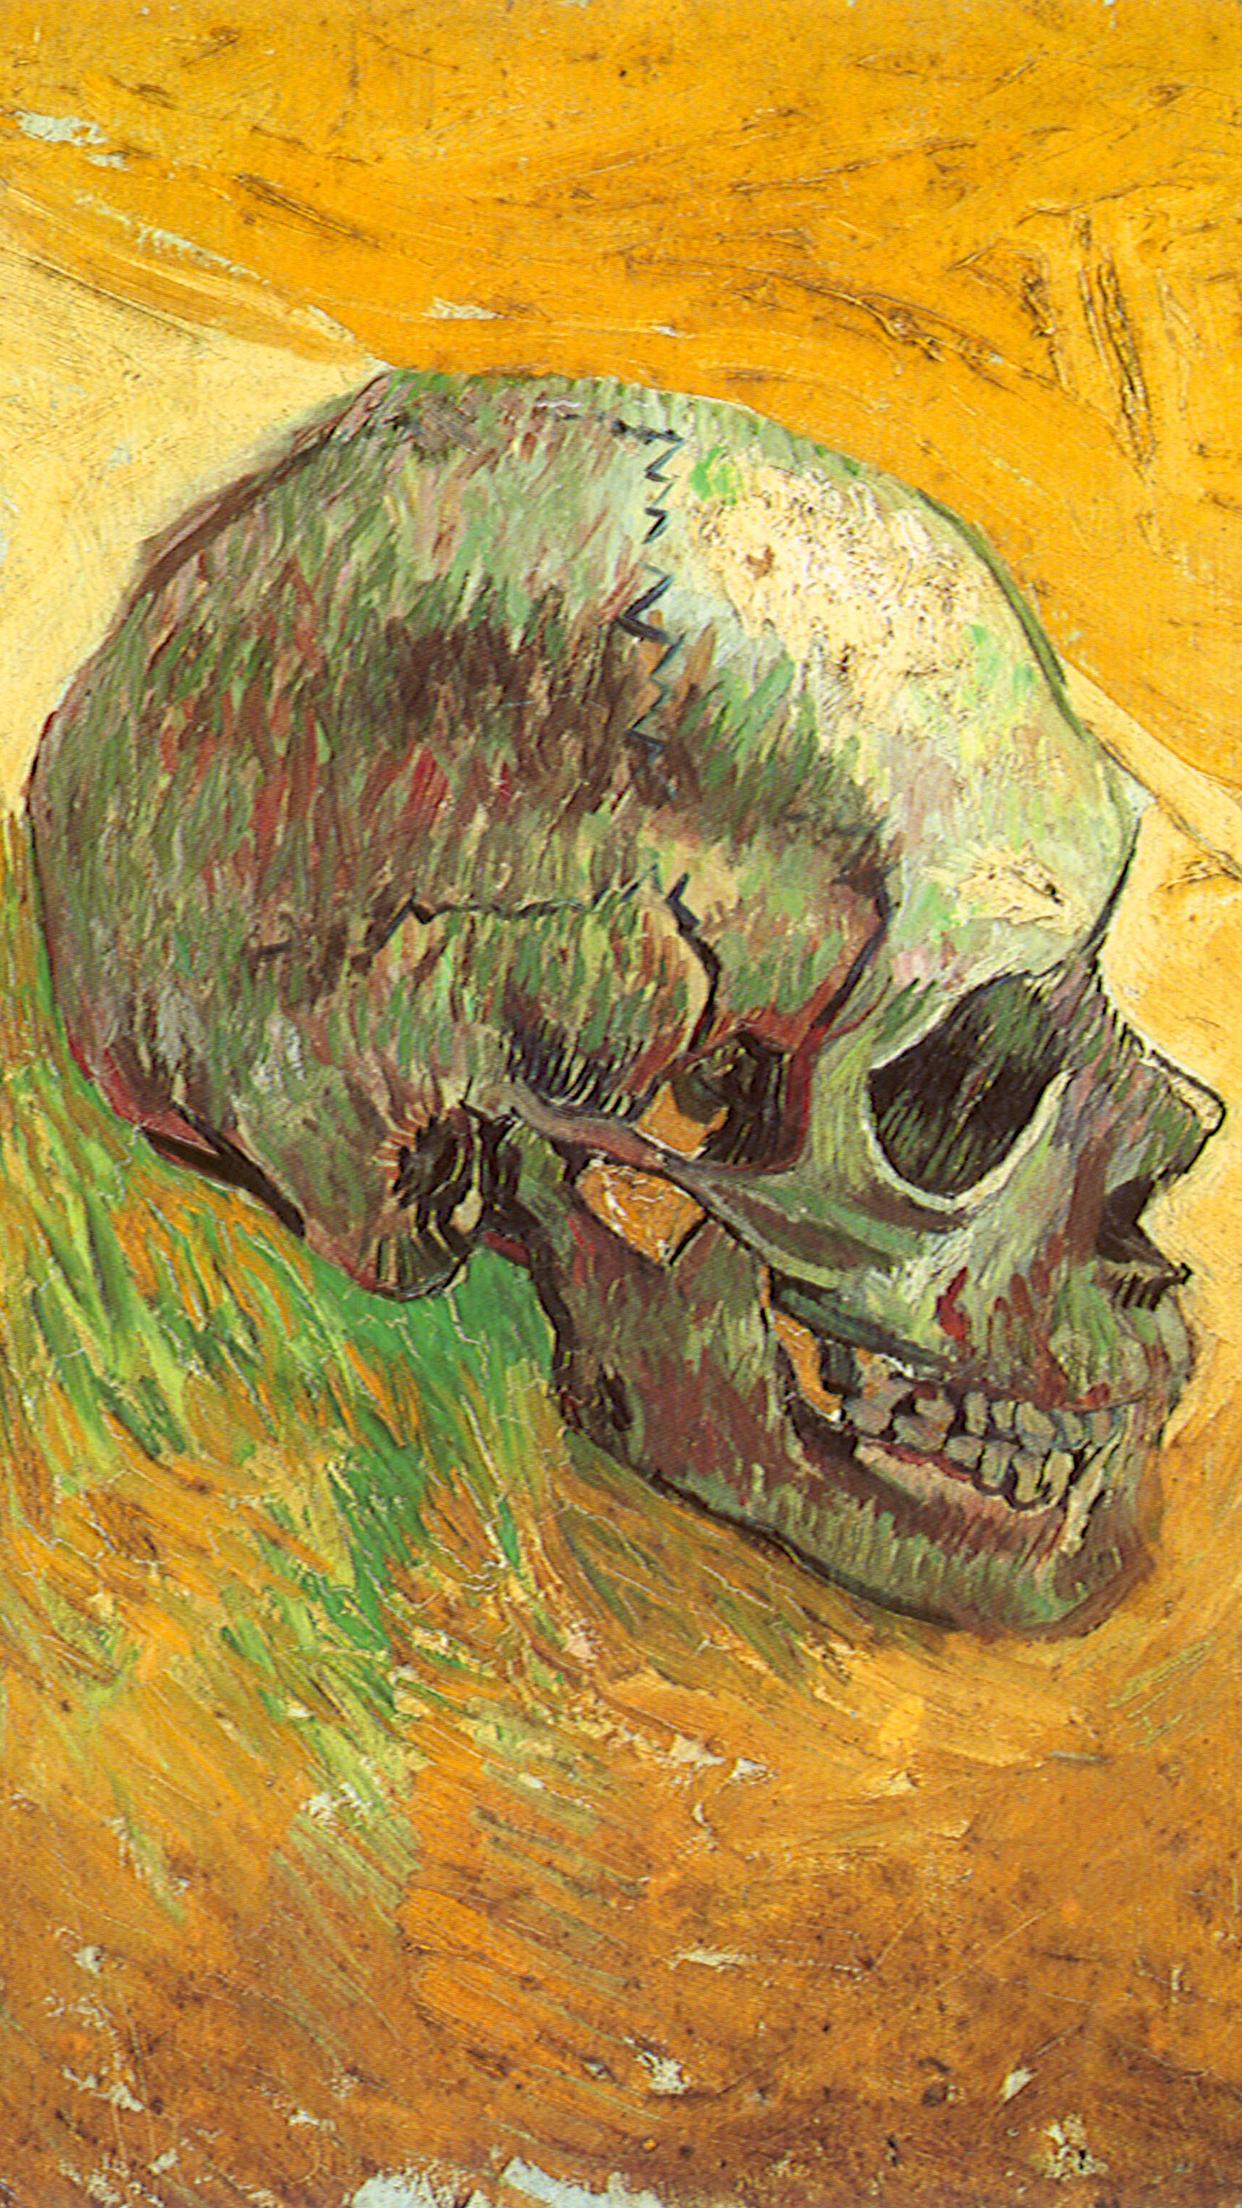 47+] Van Gogh Wallpaper for iPhone on